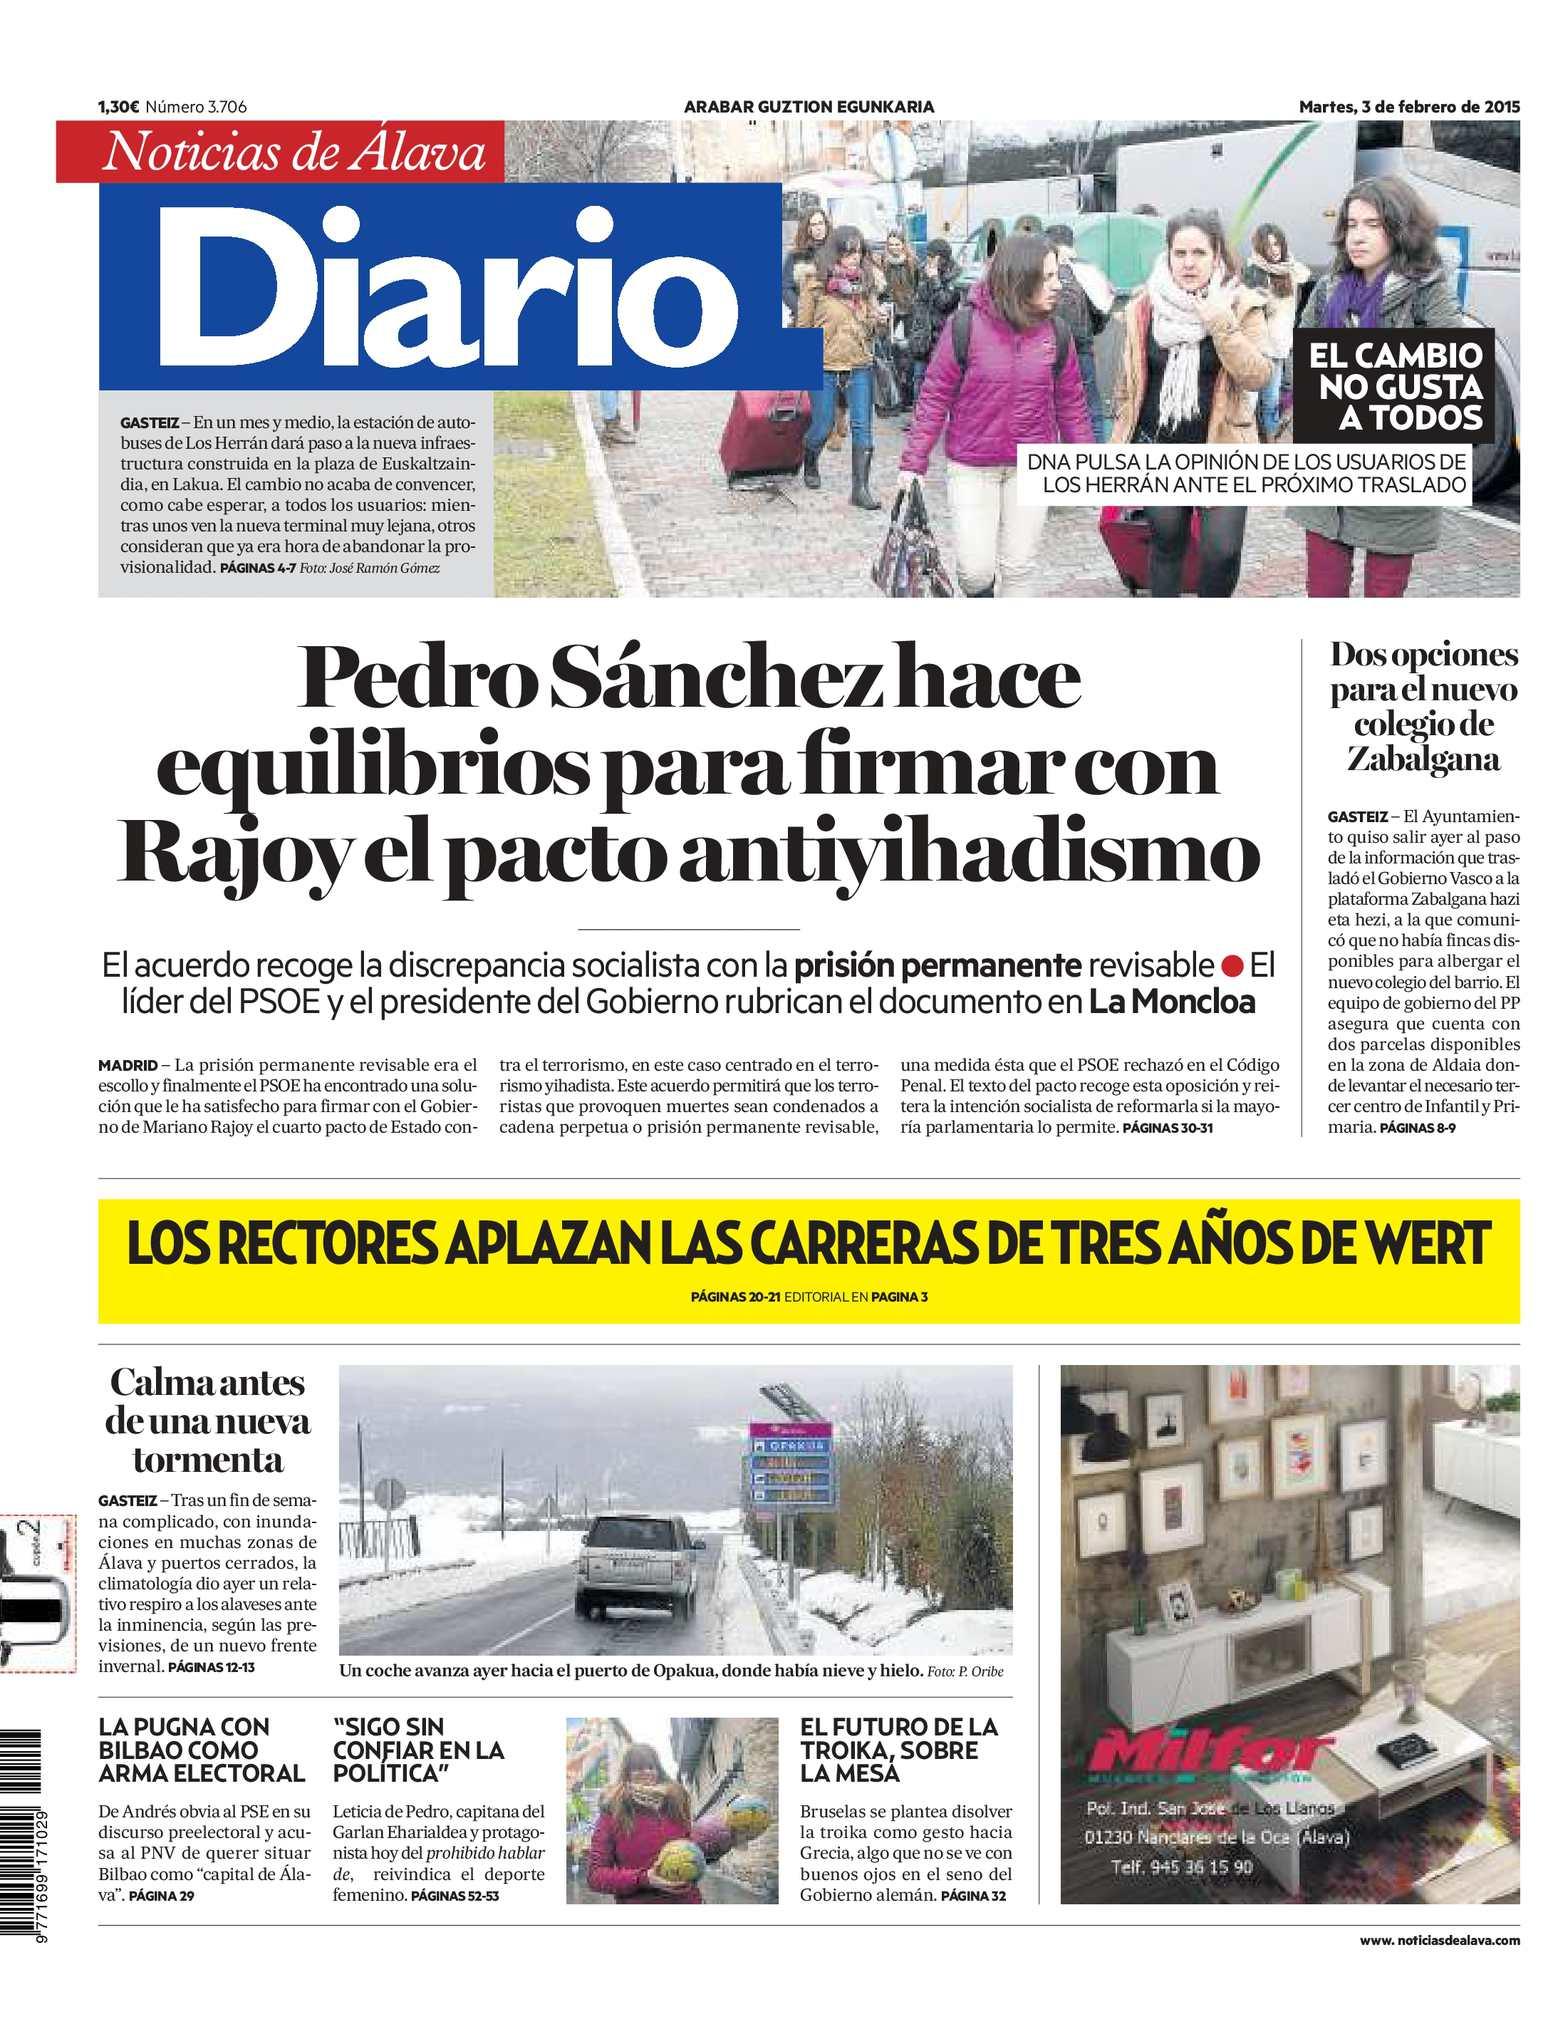 Diario de Noticias de Álava 20150203